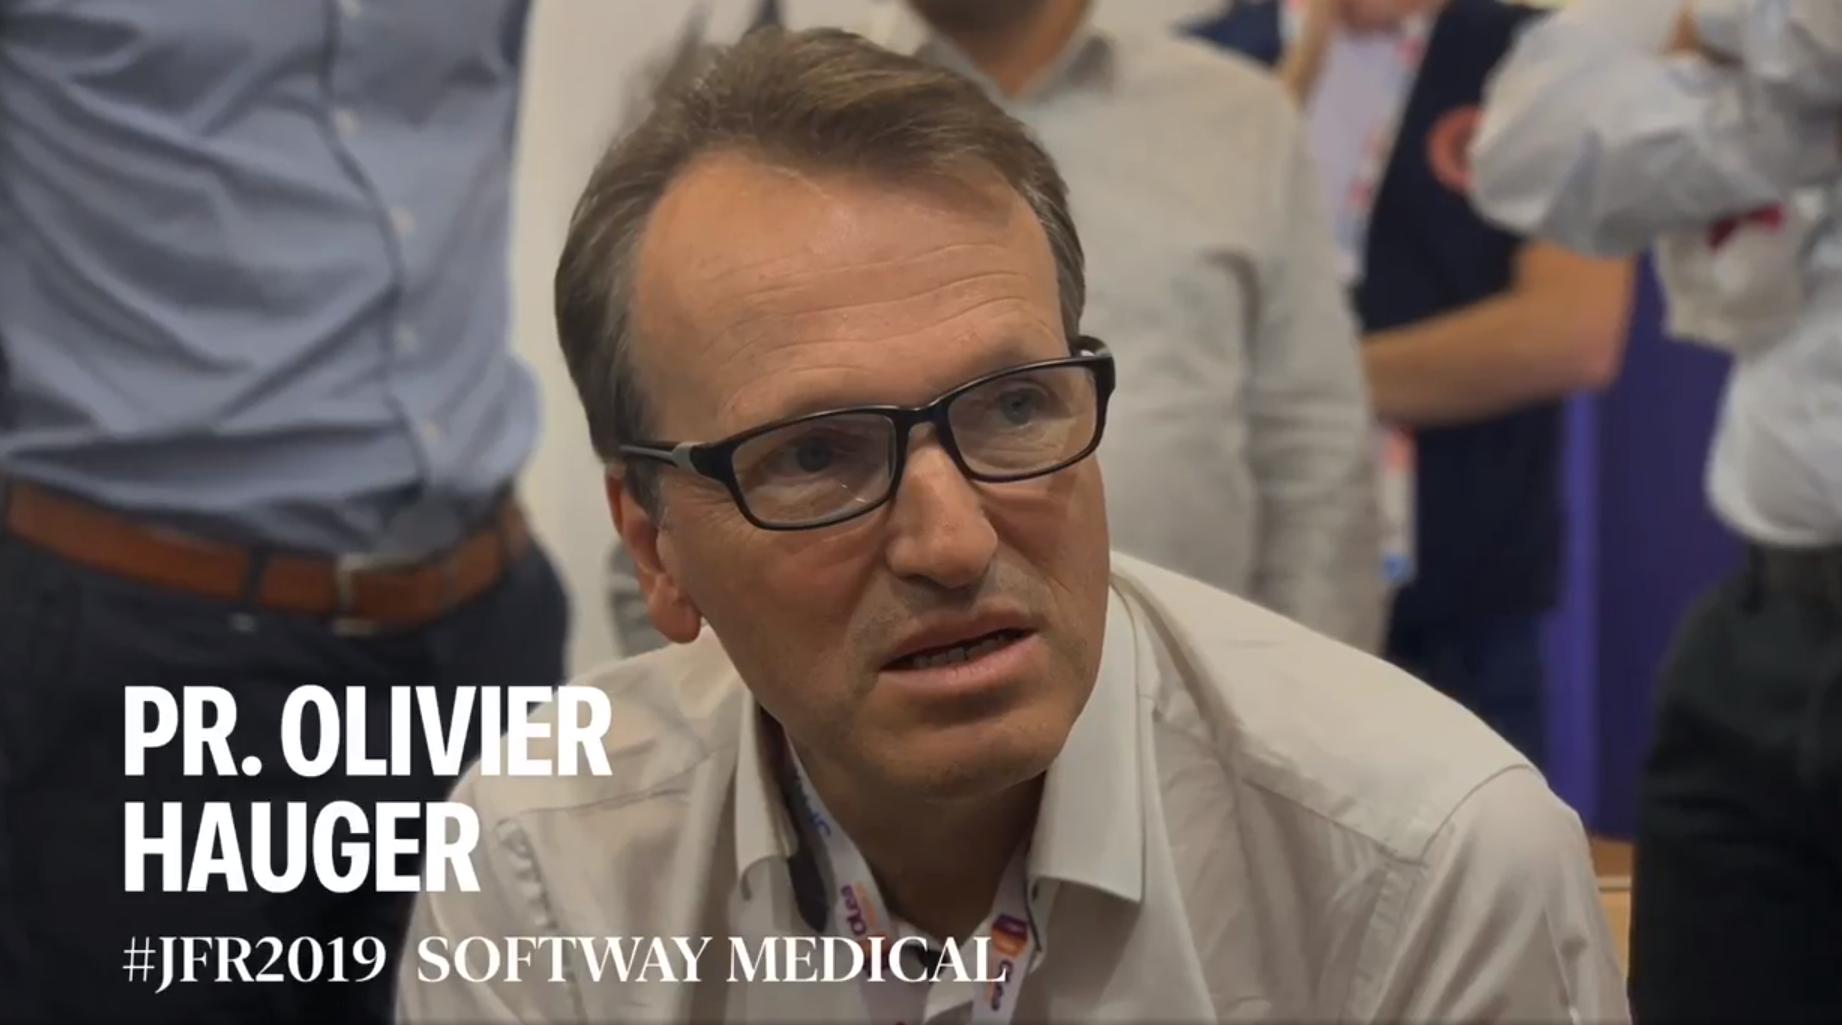 #JFR2019   LE PROFESSEUR OLIVIER HAUGER SUR LE STAND DE SOFTWAY MEDICAL